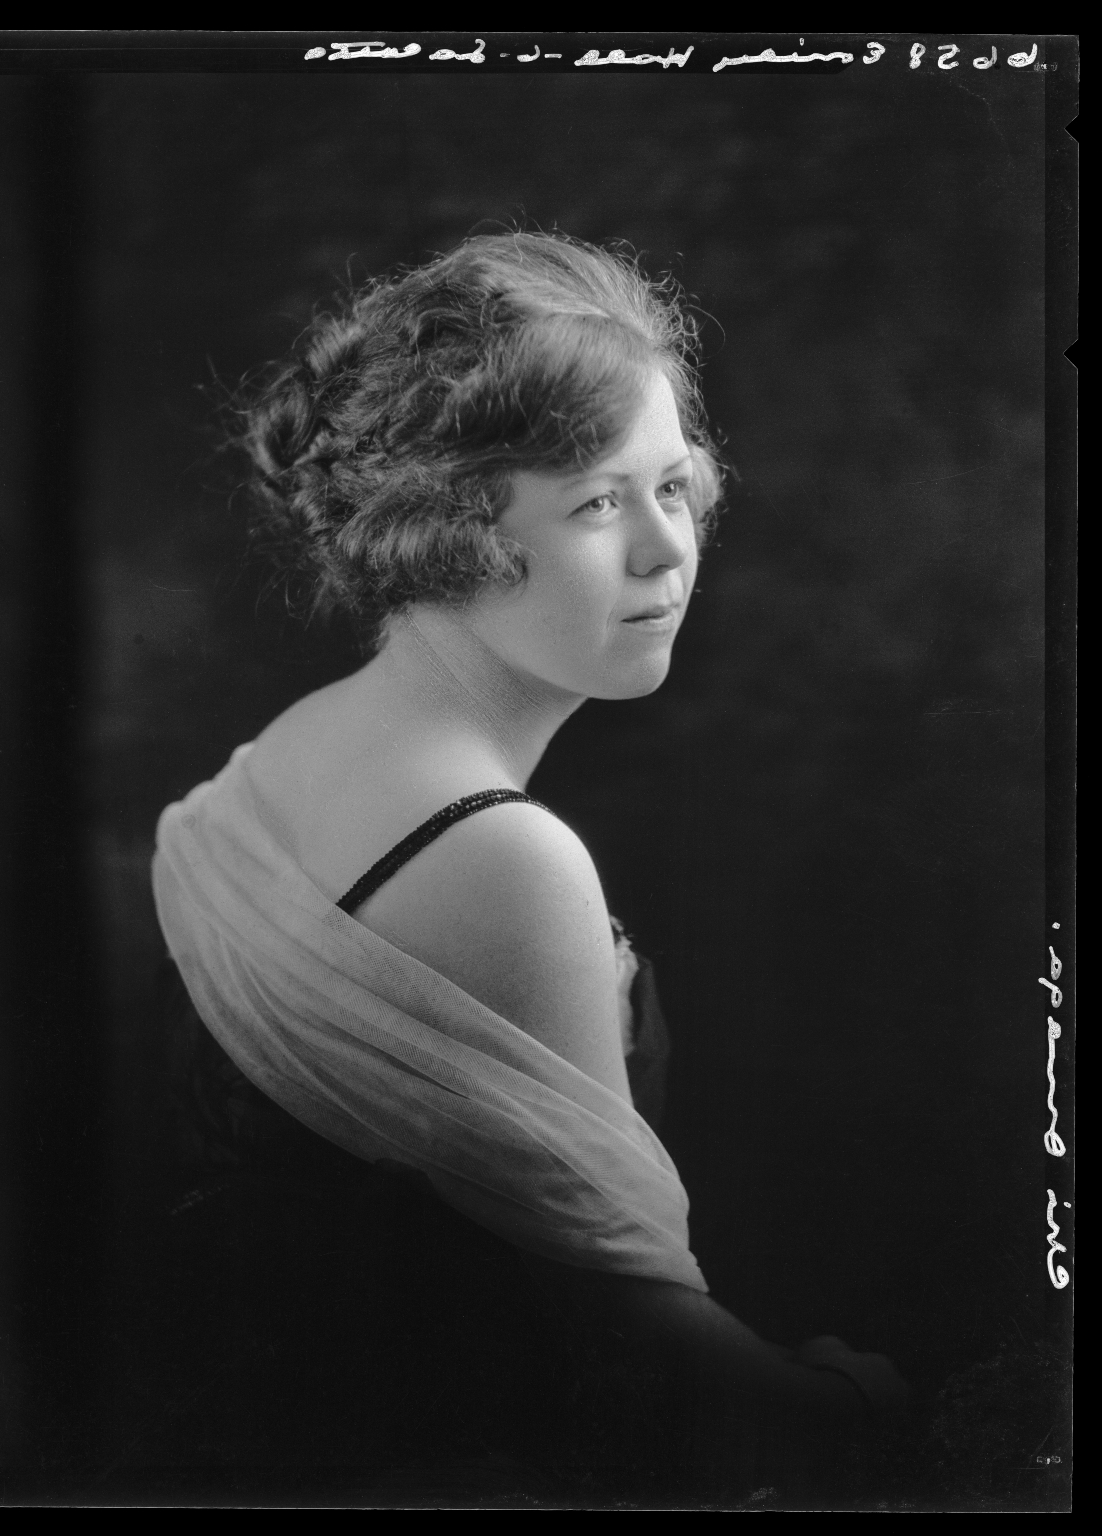 Portraits of Emily Hall